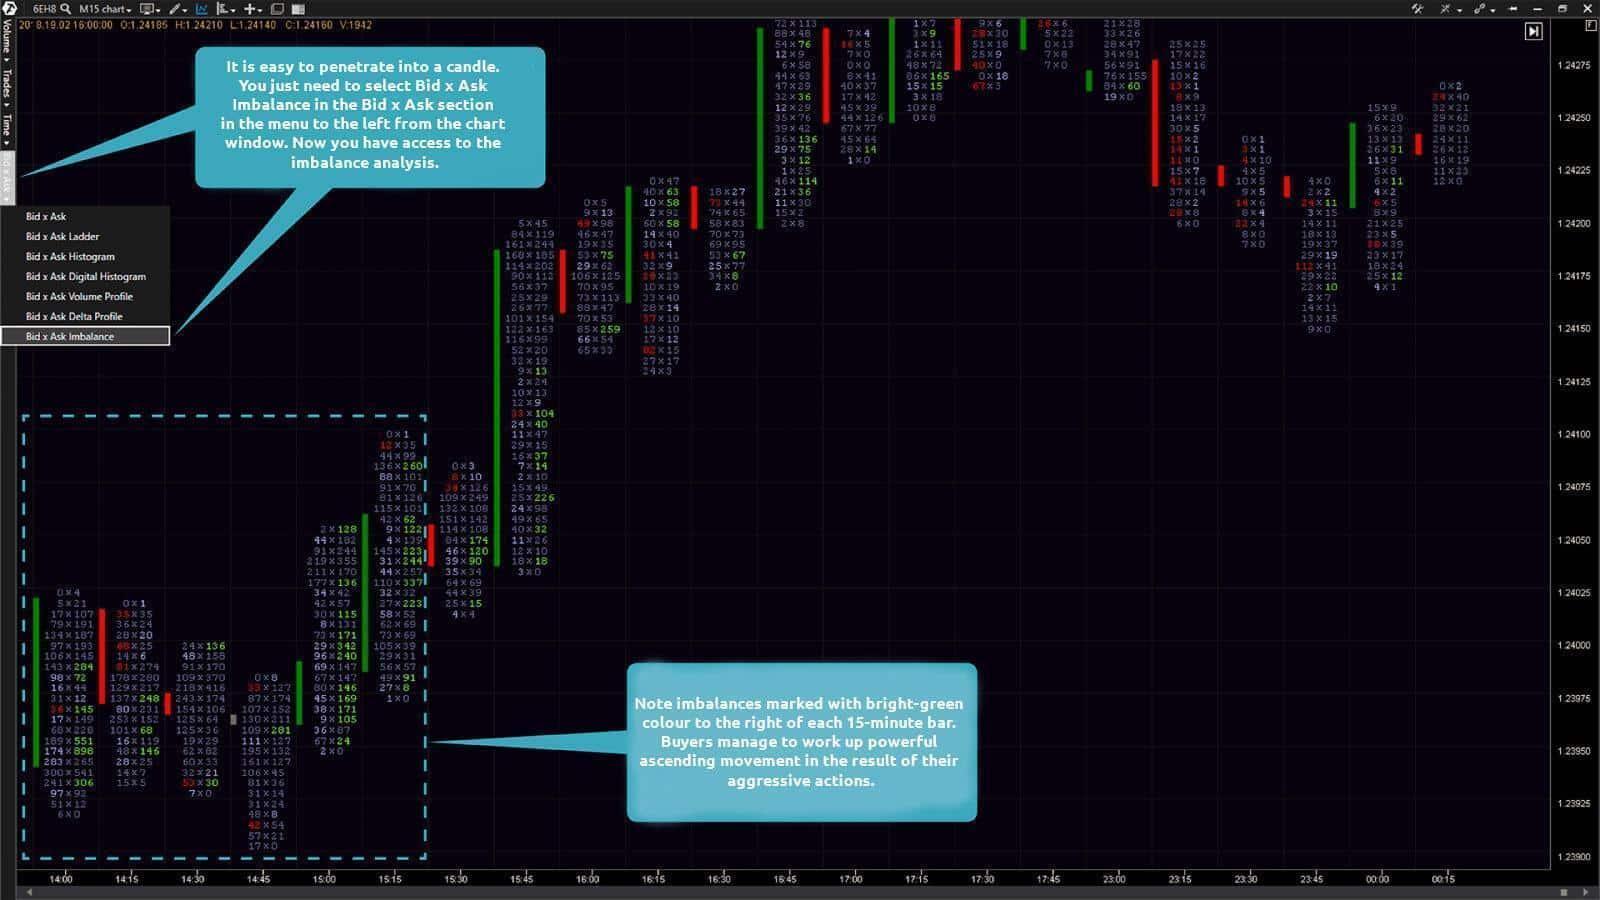 15-minute EUR futures (ticker: 6E) chart. Bid x Ask Imbalance footprint chart